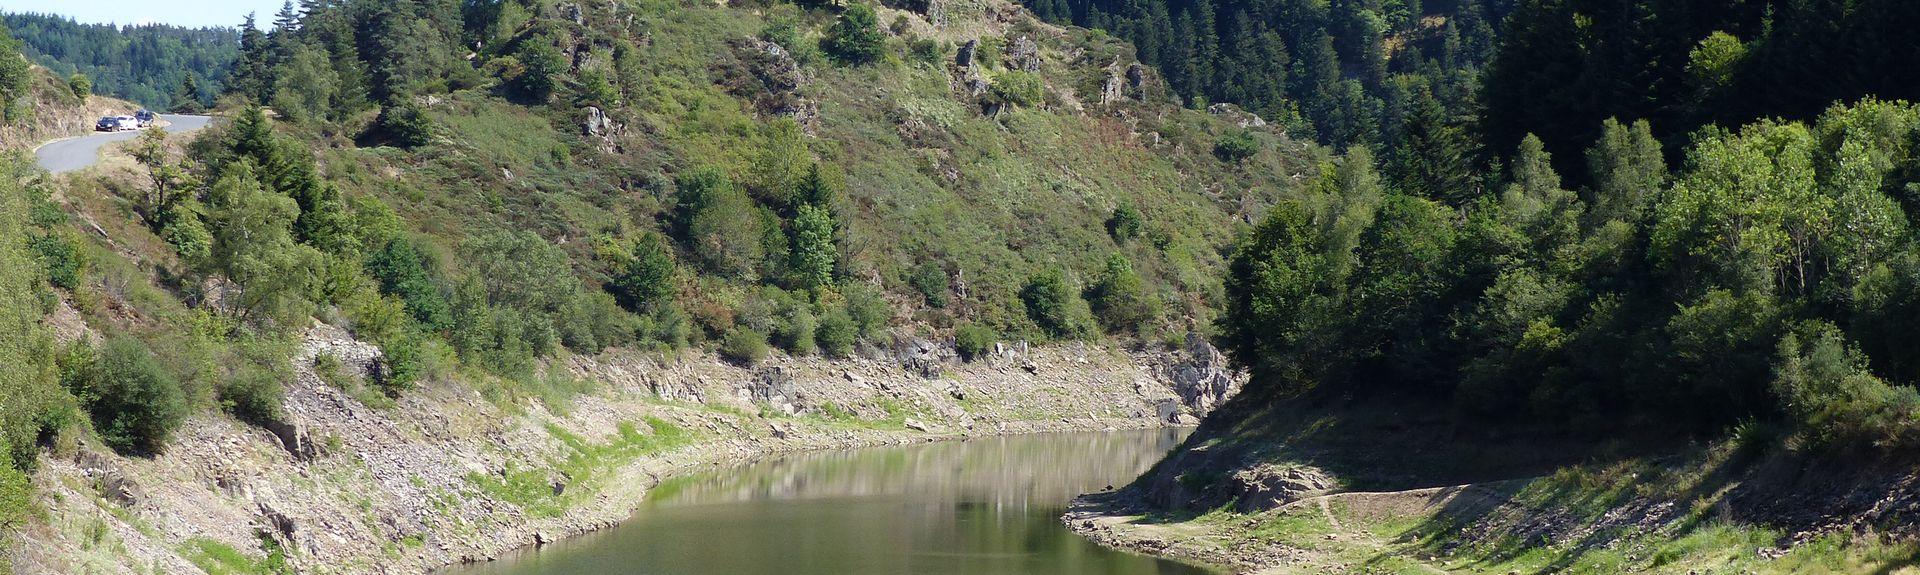 Blesle, Auvergne Rhône-Alpes, Frankrike